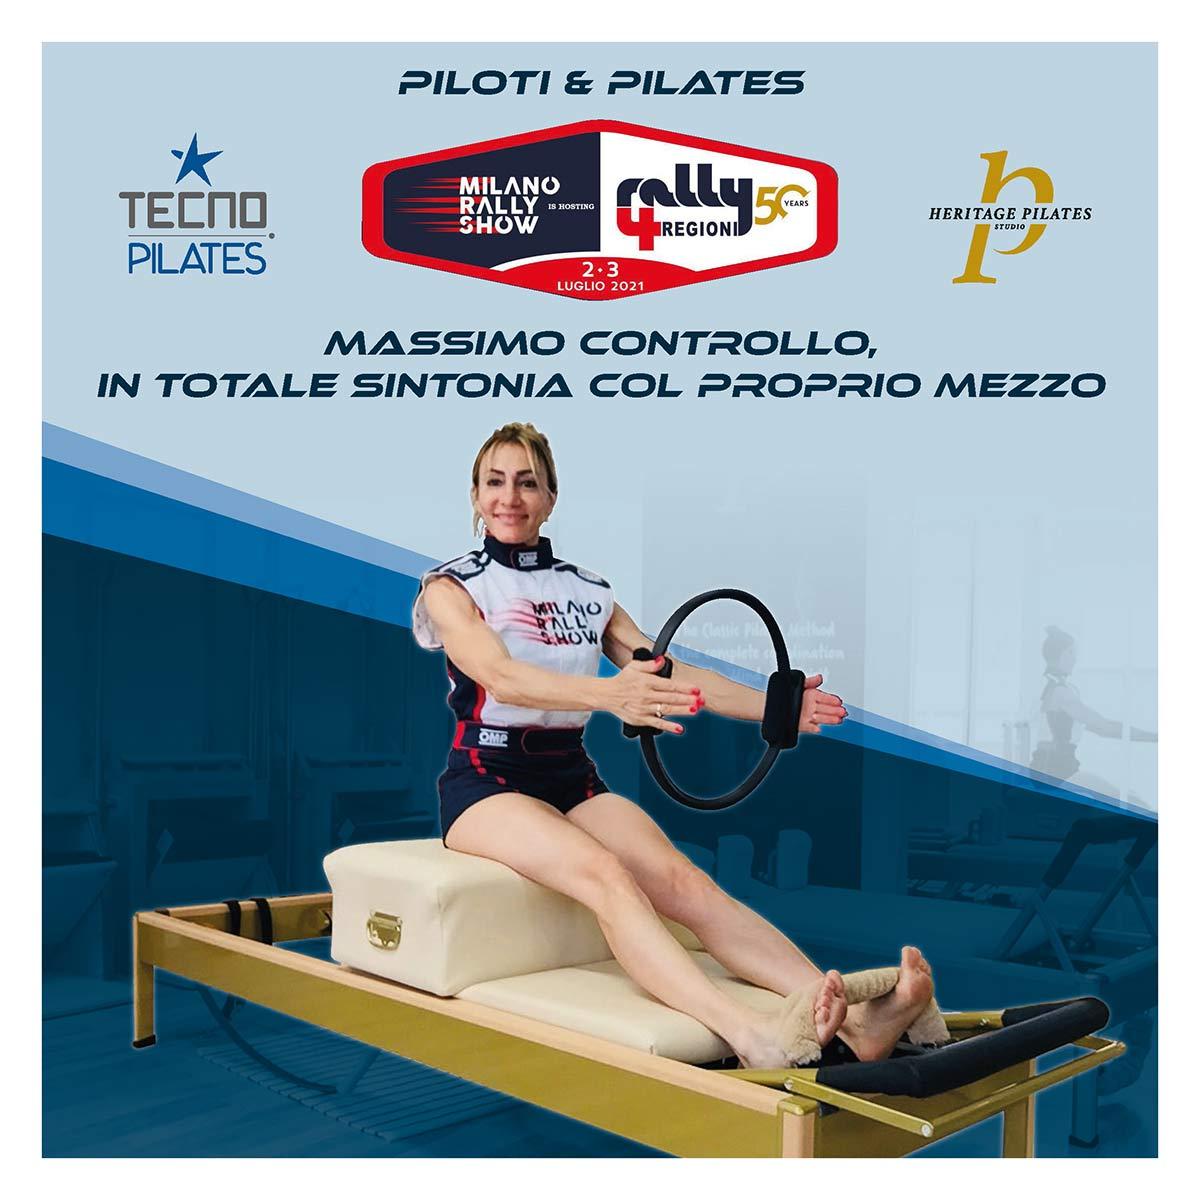 PILOTI E PILATES - SALICE TERME - RALLY 4 REGIONI | 2 LUGLIO 2021